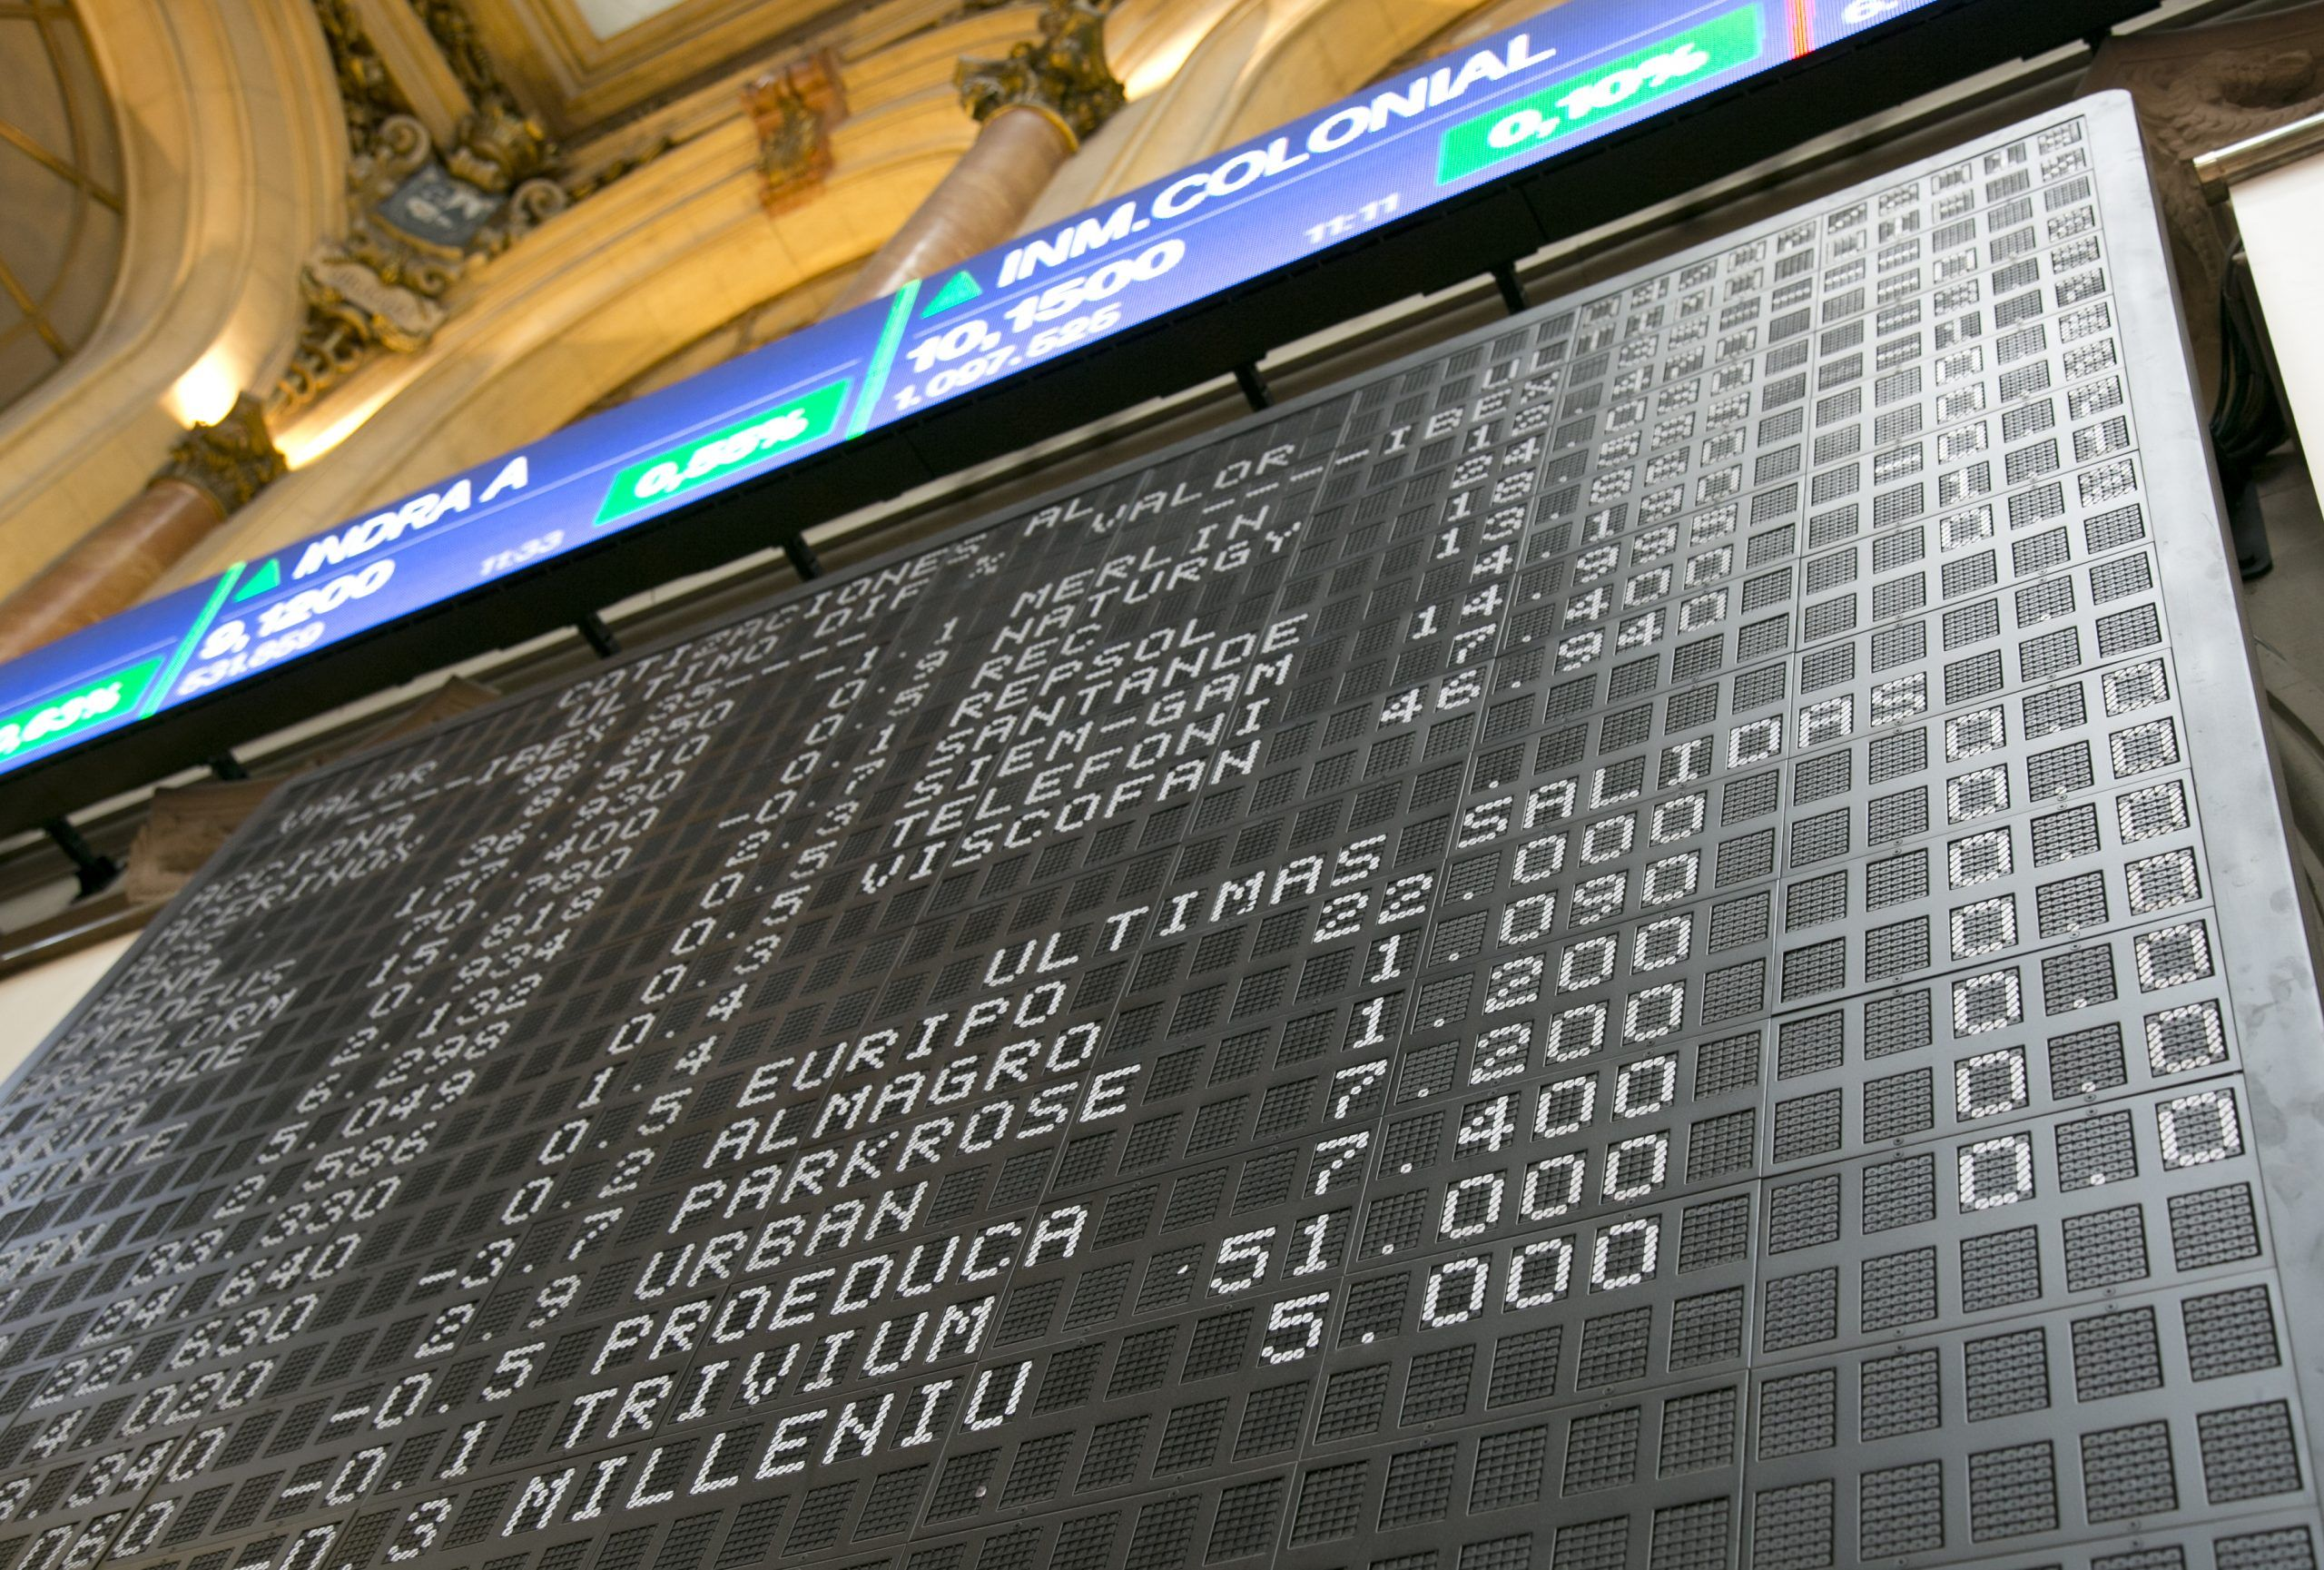 Bolsa Madrid pantalla salidas. Fuente BME scaled